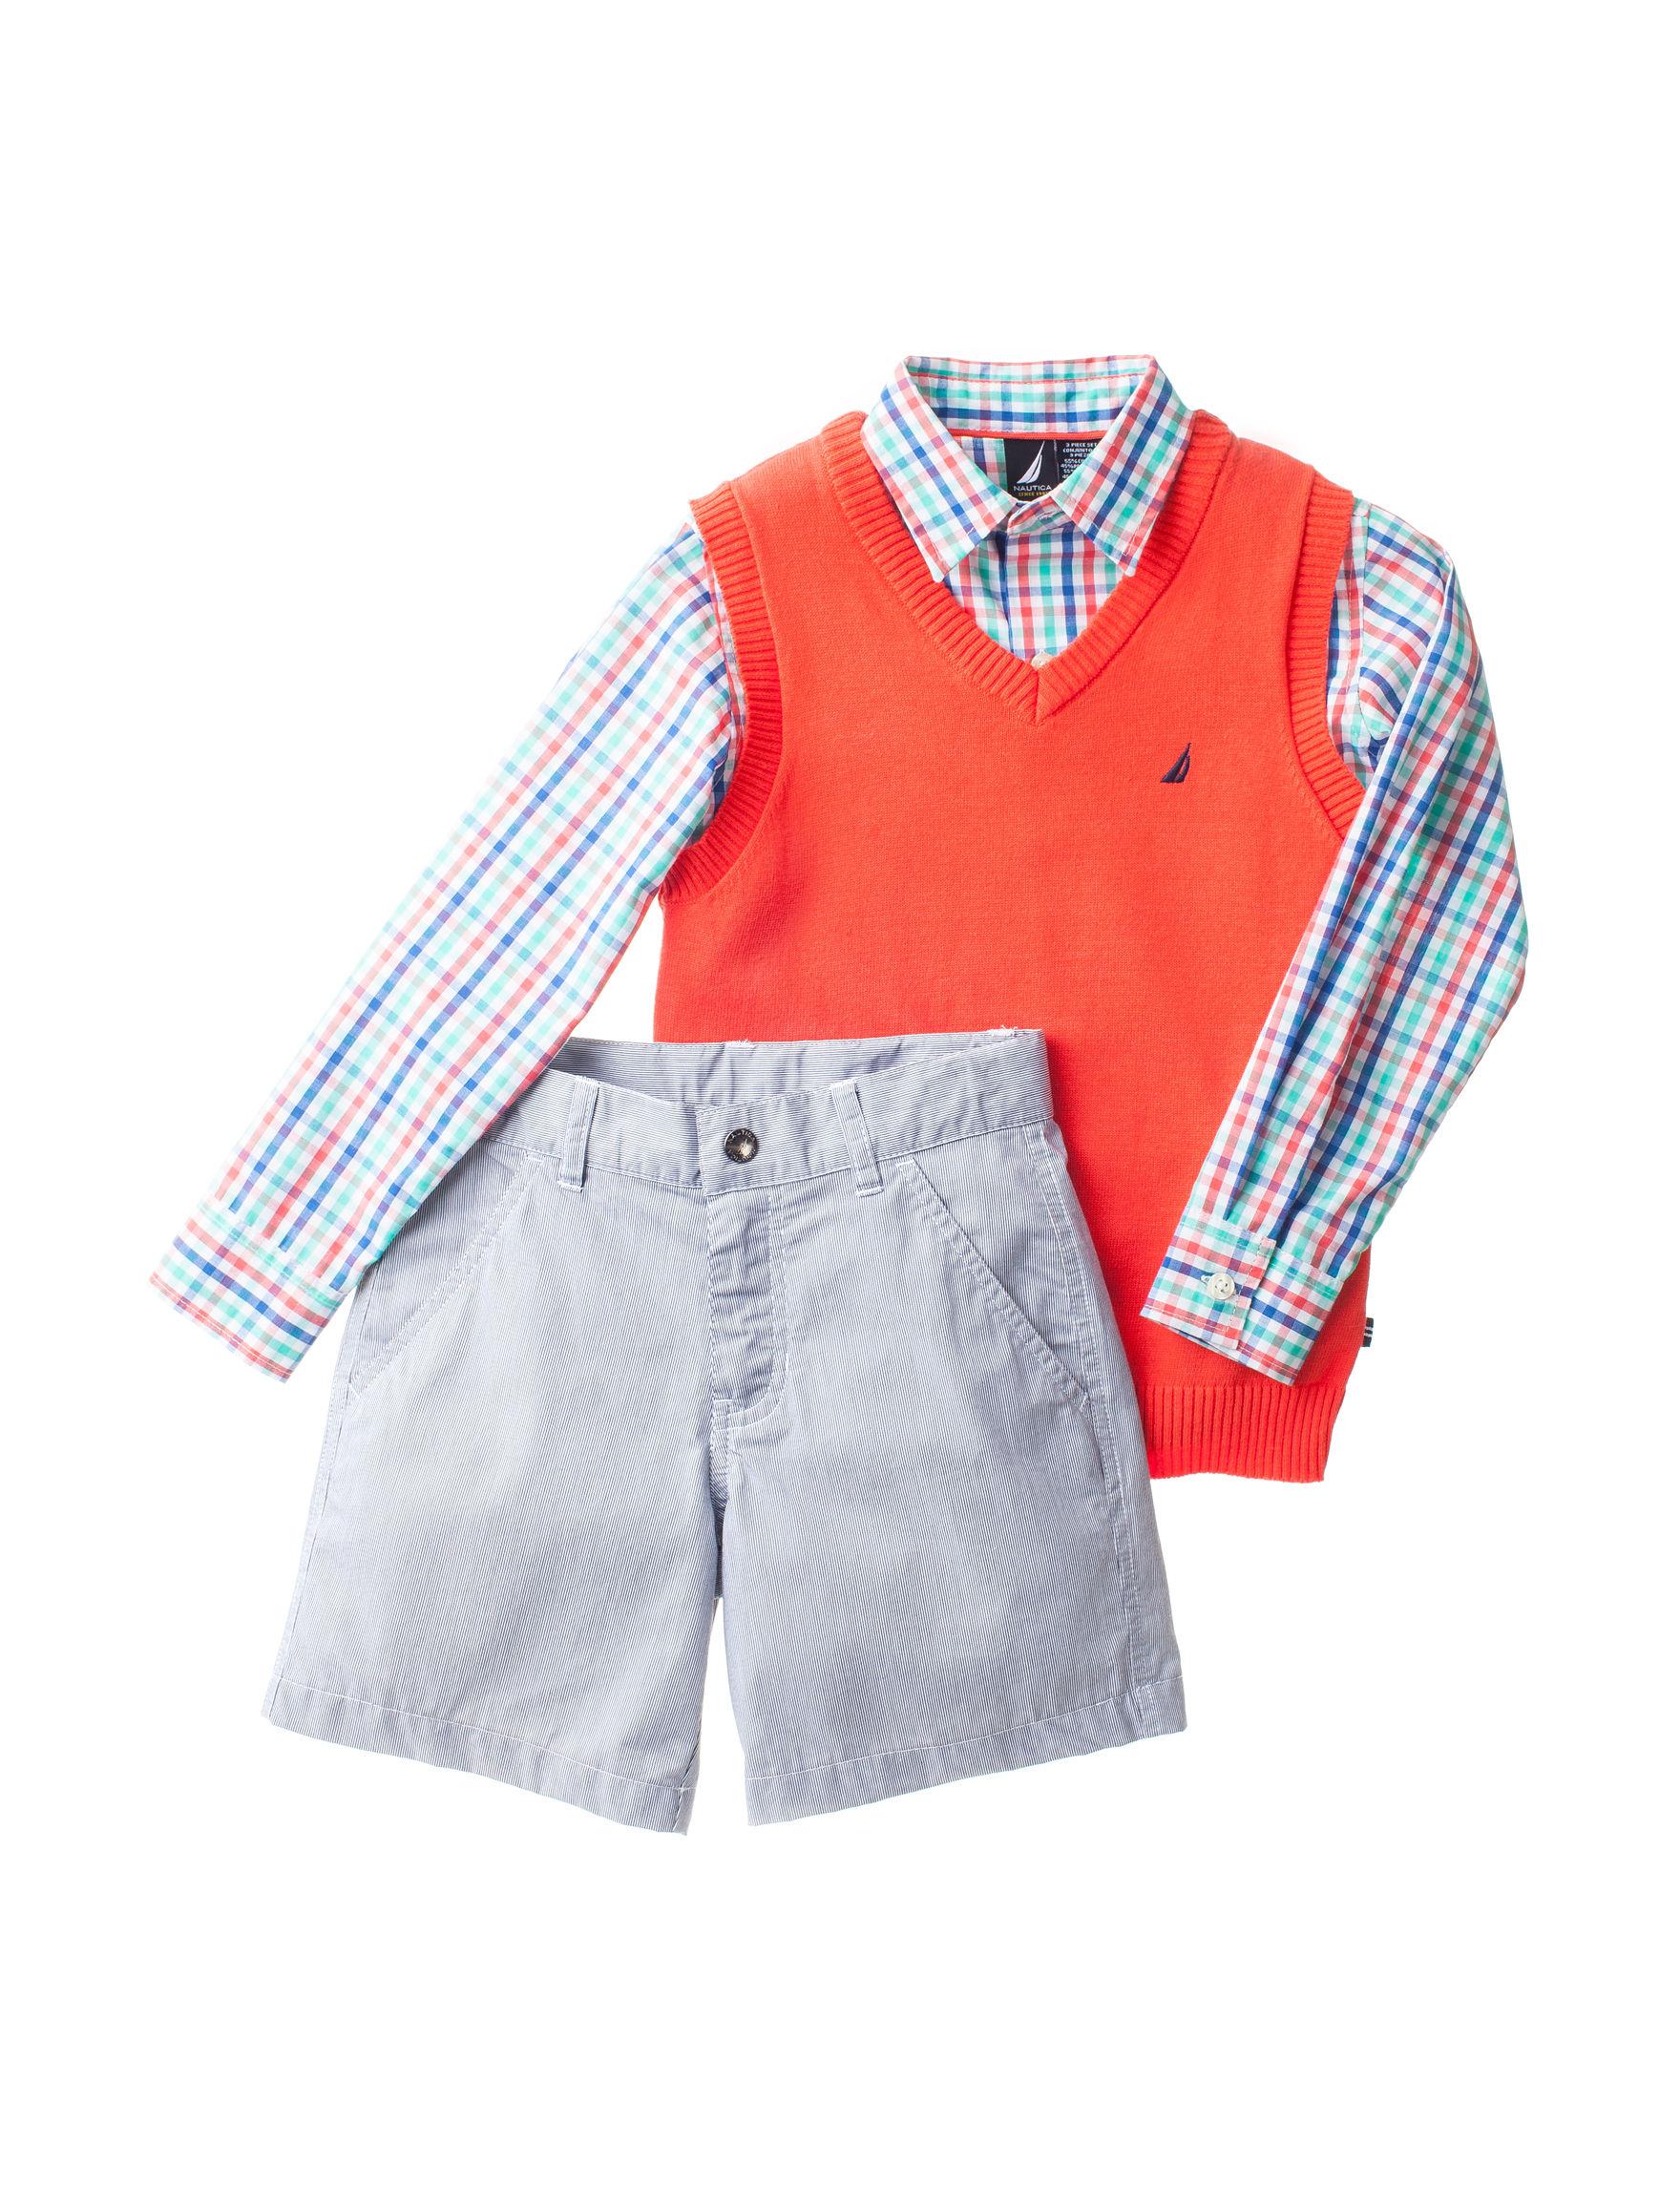 Nautica 3-pc. Sweater Vest & Shorts Set – Boys 4-7 | Stage Stores